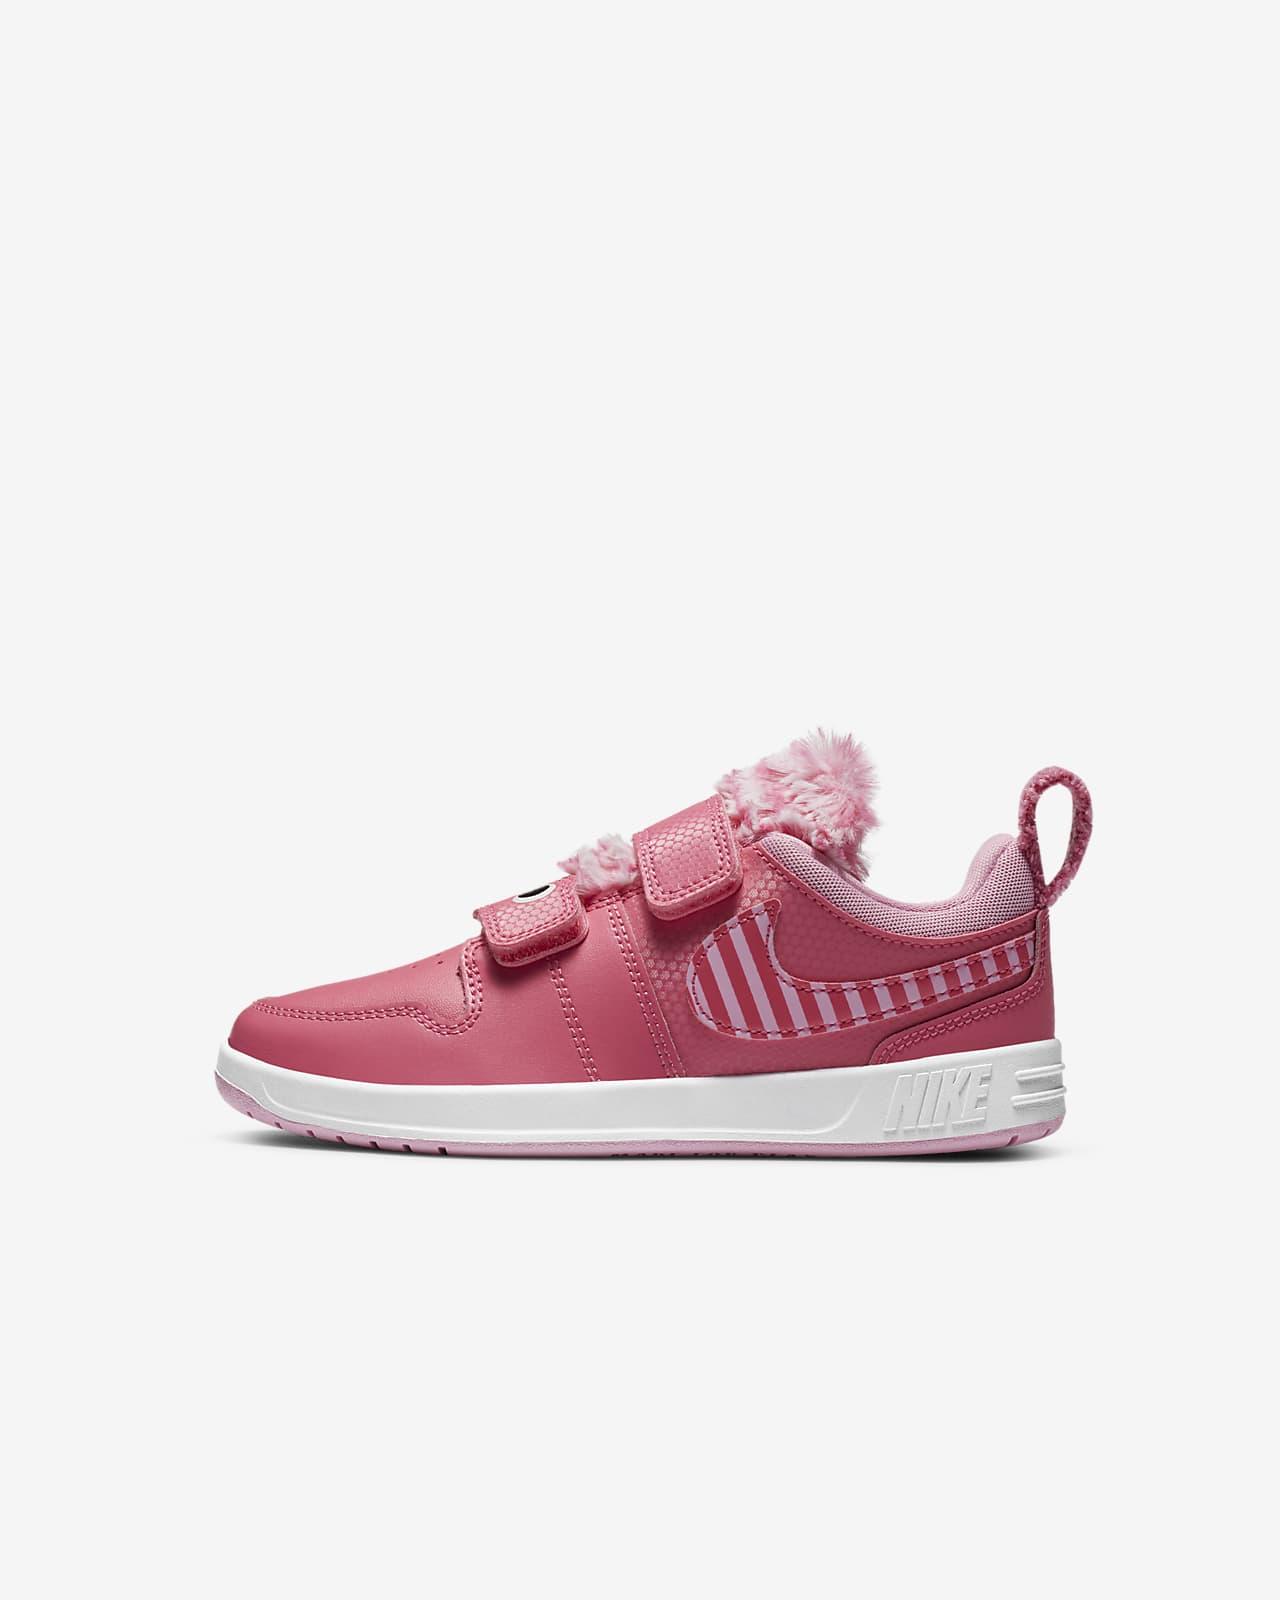 Nike Pico 5 Fast n Furry Little Kids' Shoes